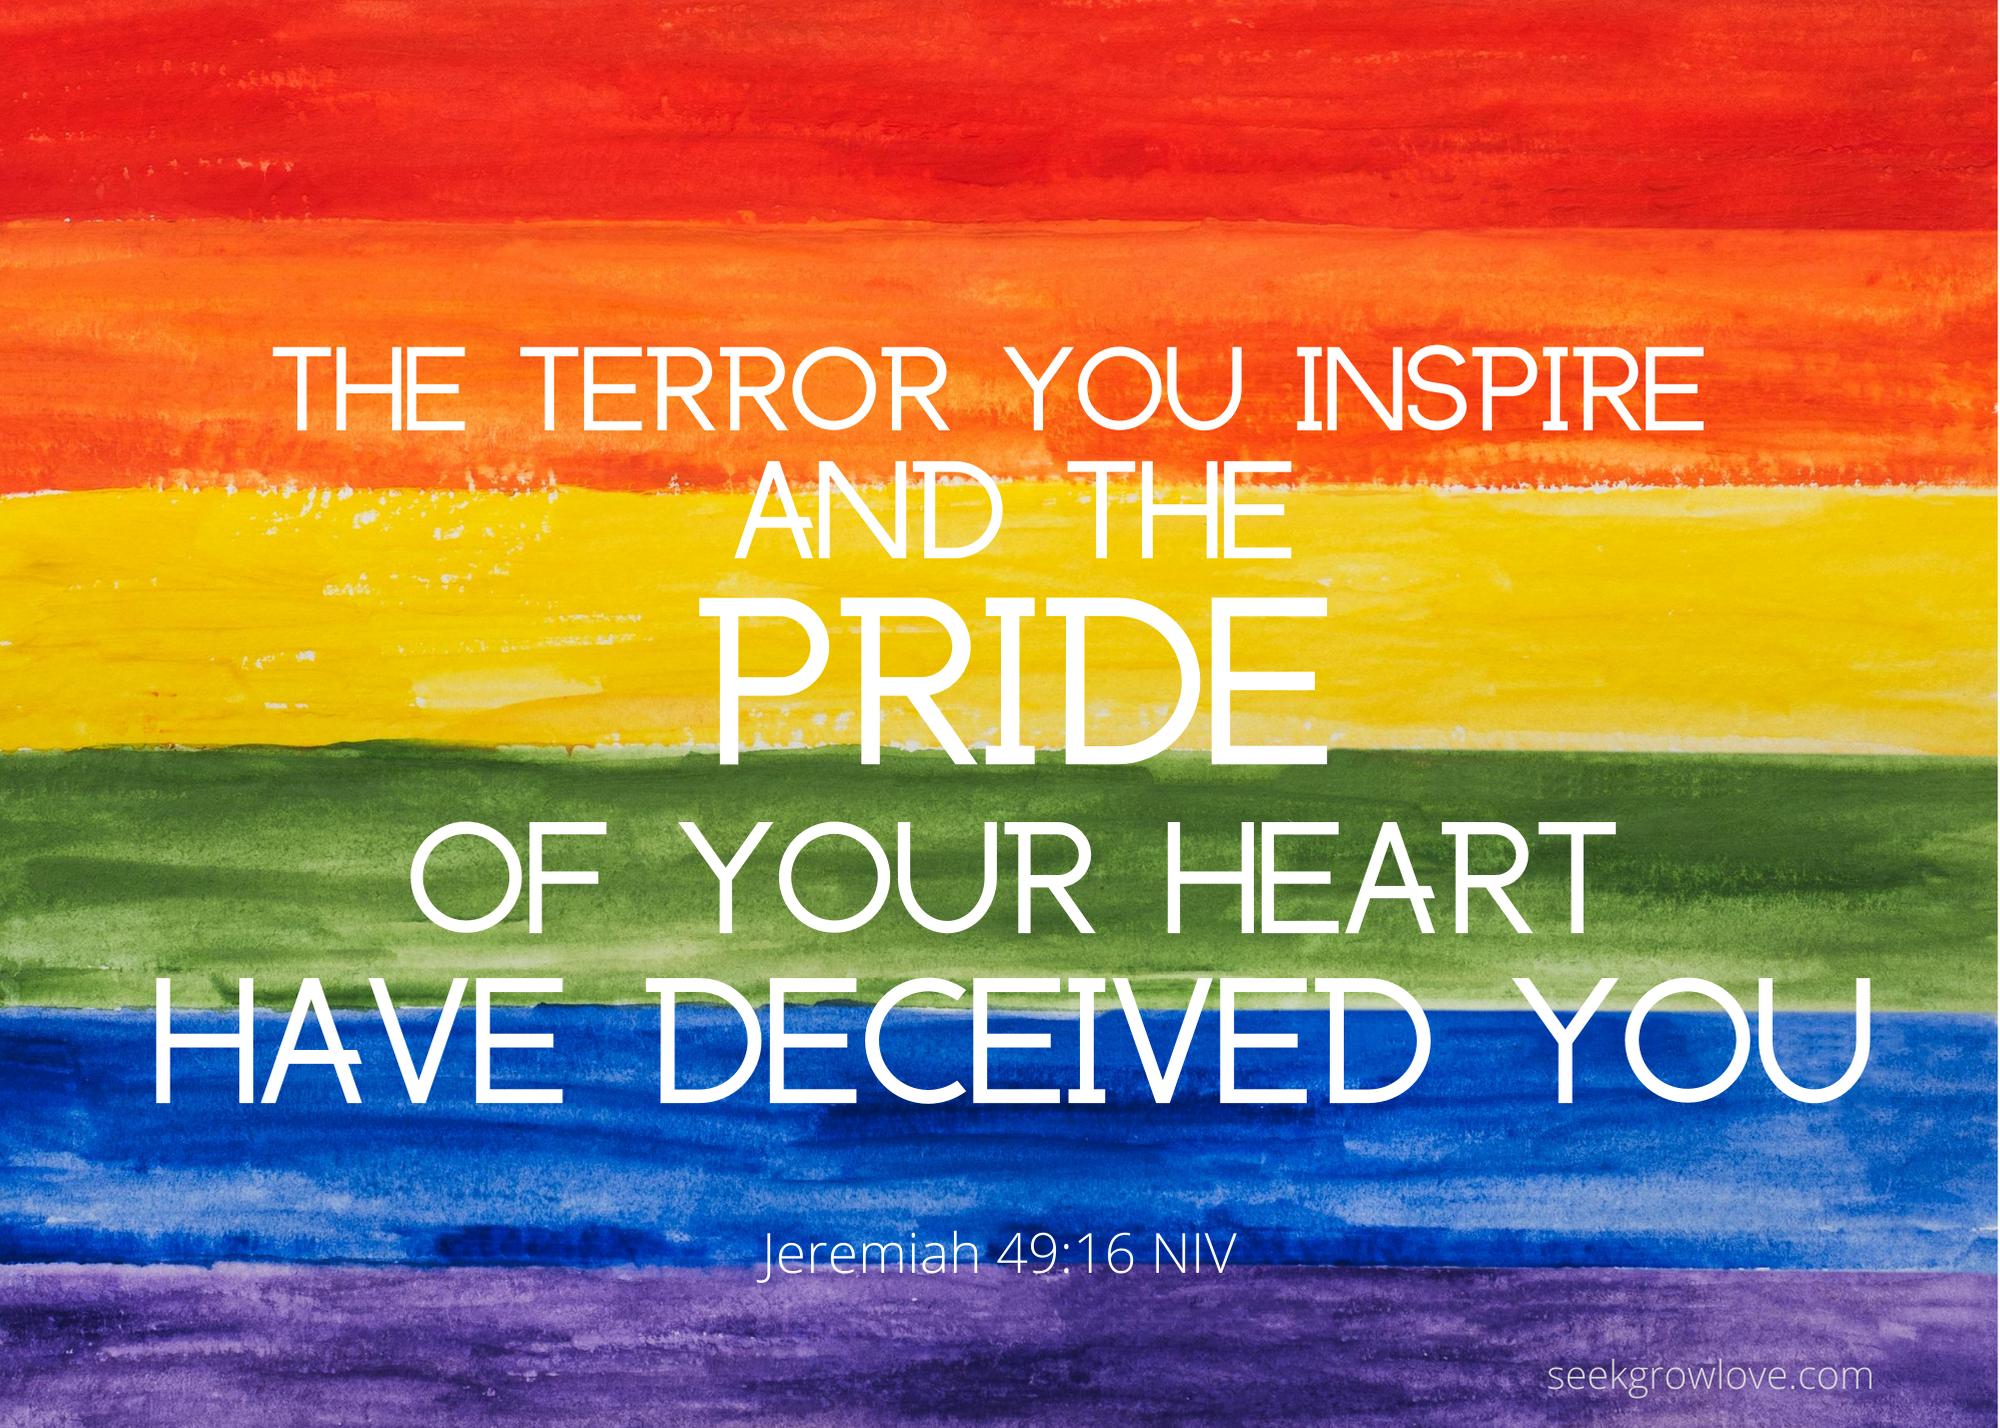 Jeremiah 49 16 NIV sgl